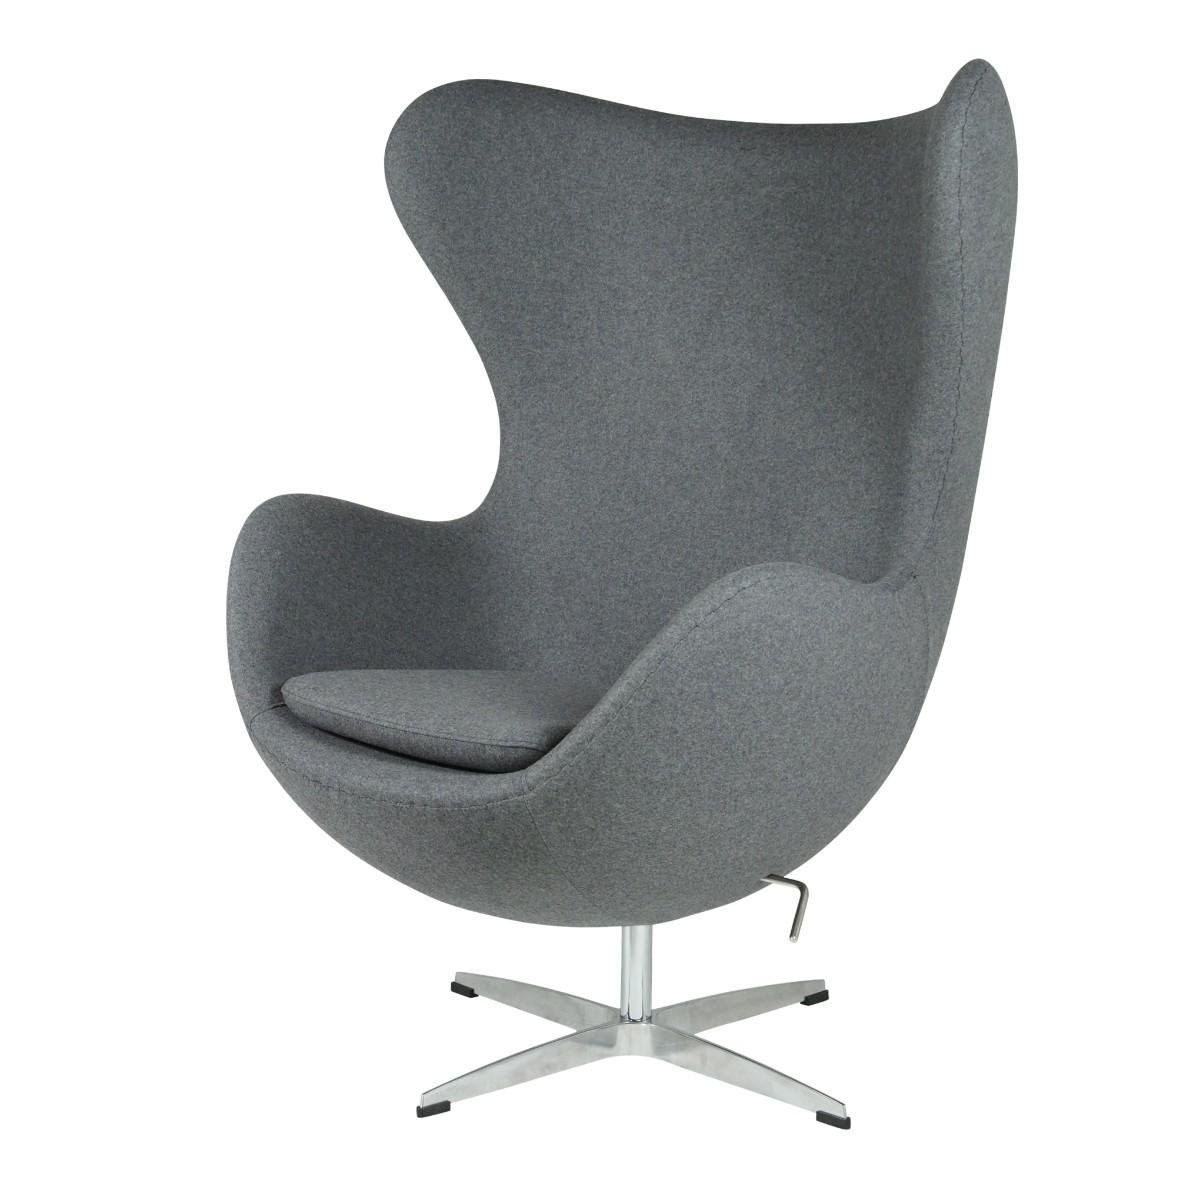 Arne Jacobsen Lounge Chair Egg Chair Mustard